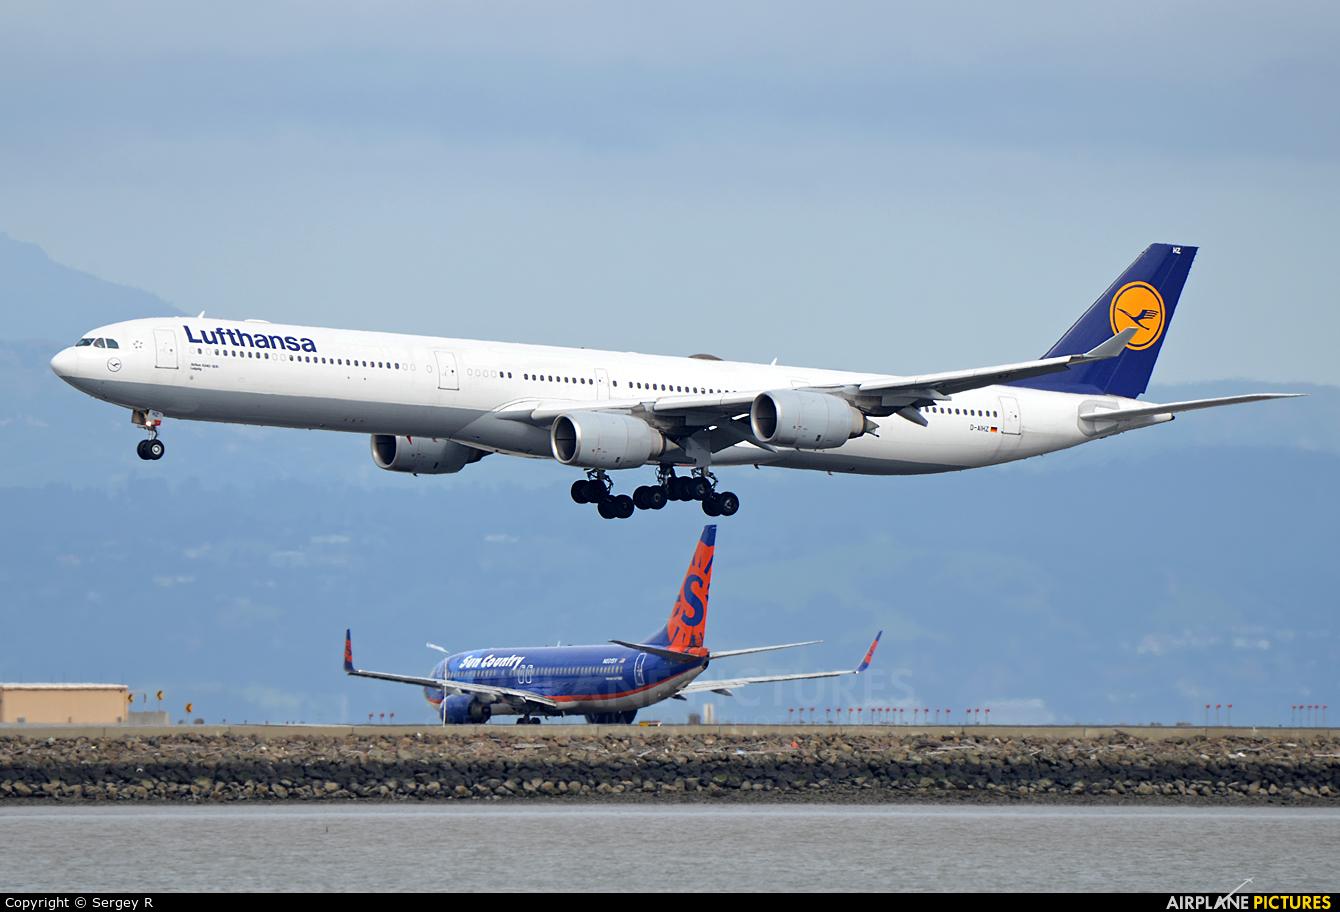 Lufthansa D-AIHZ aircraft at San Francisco Intl